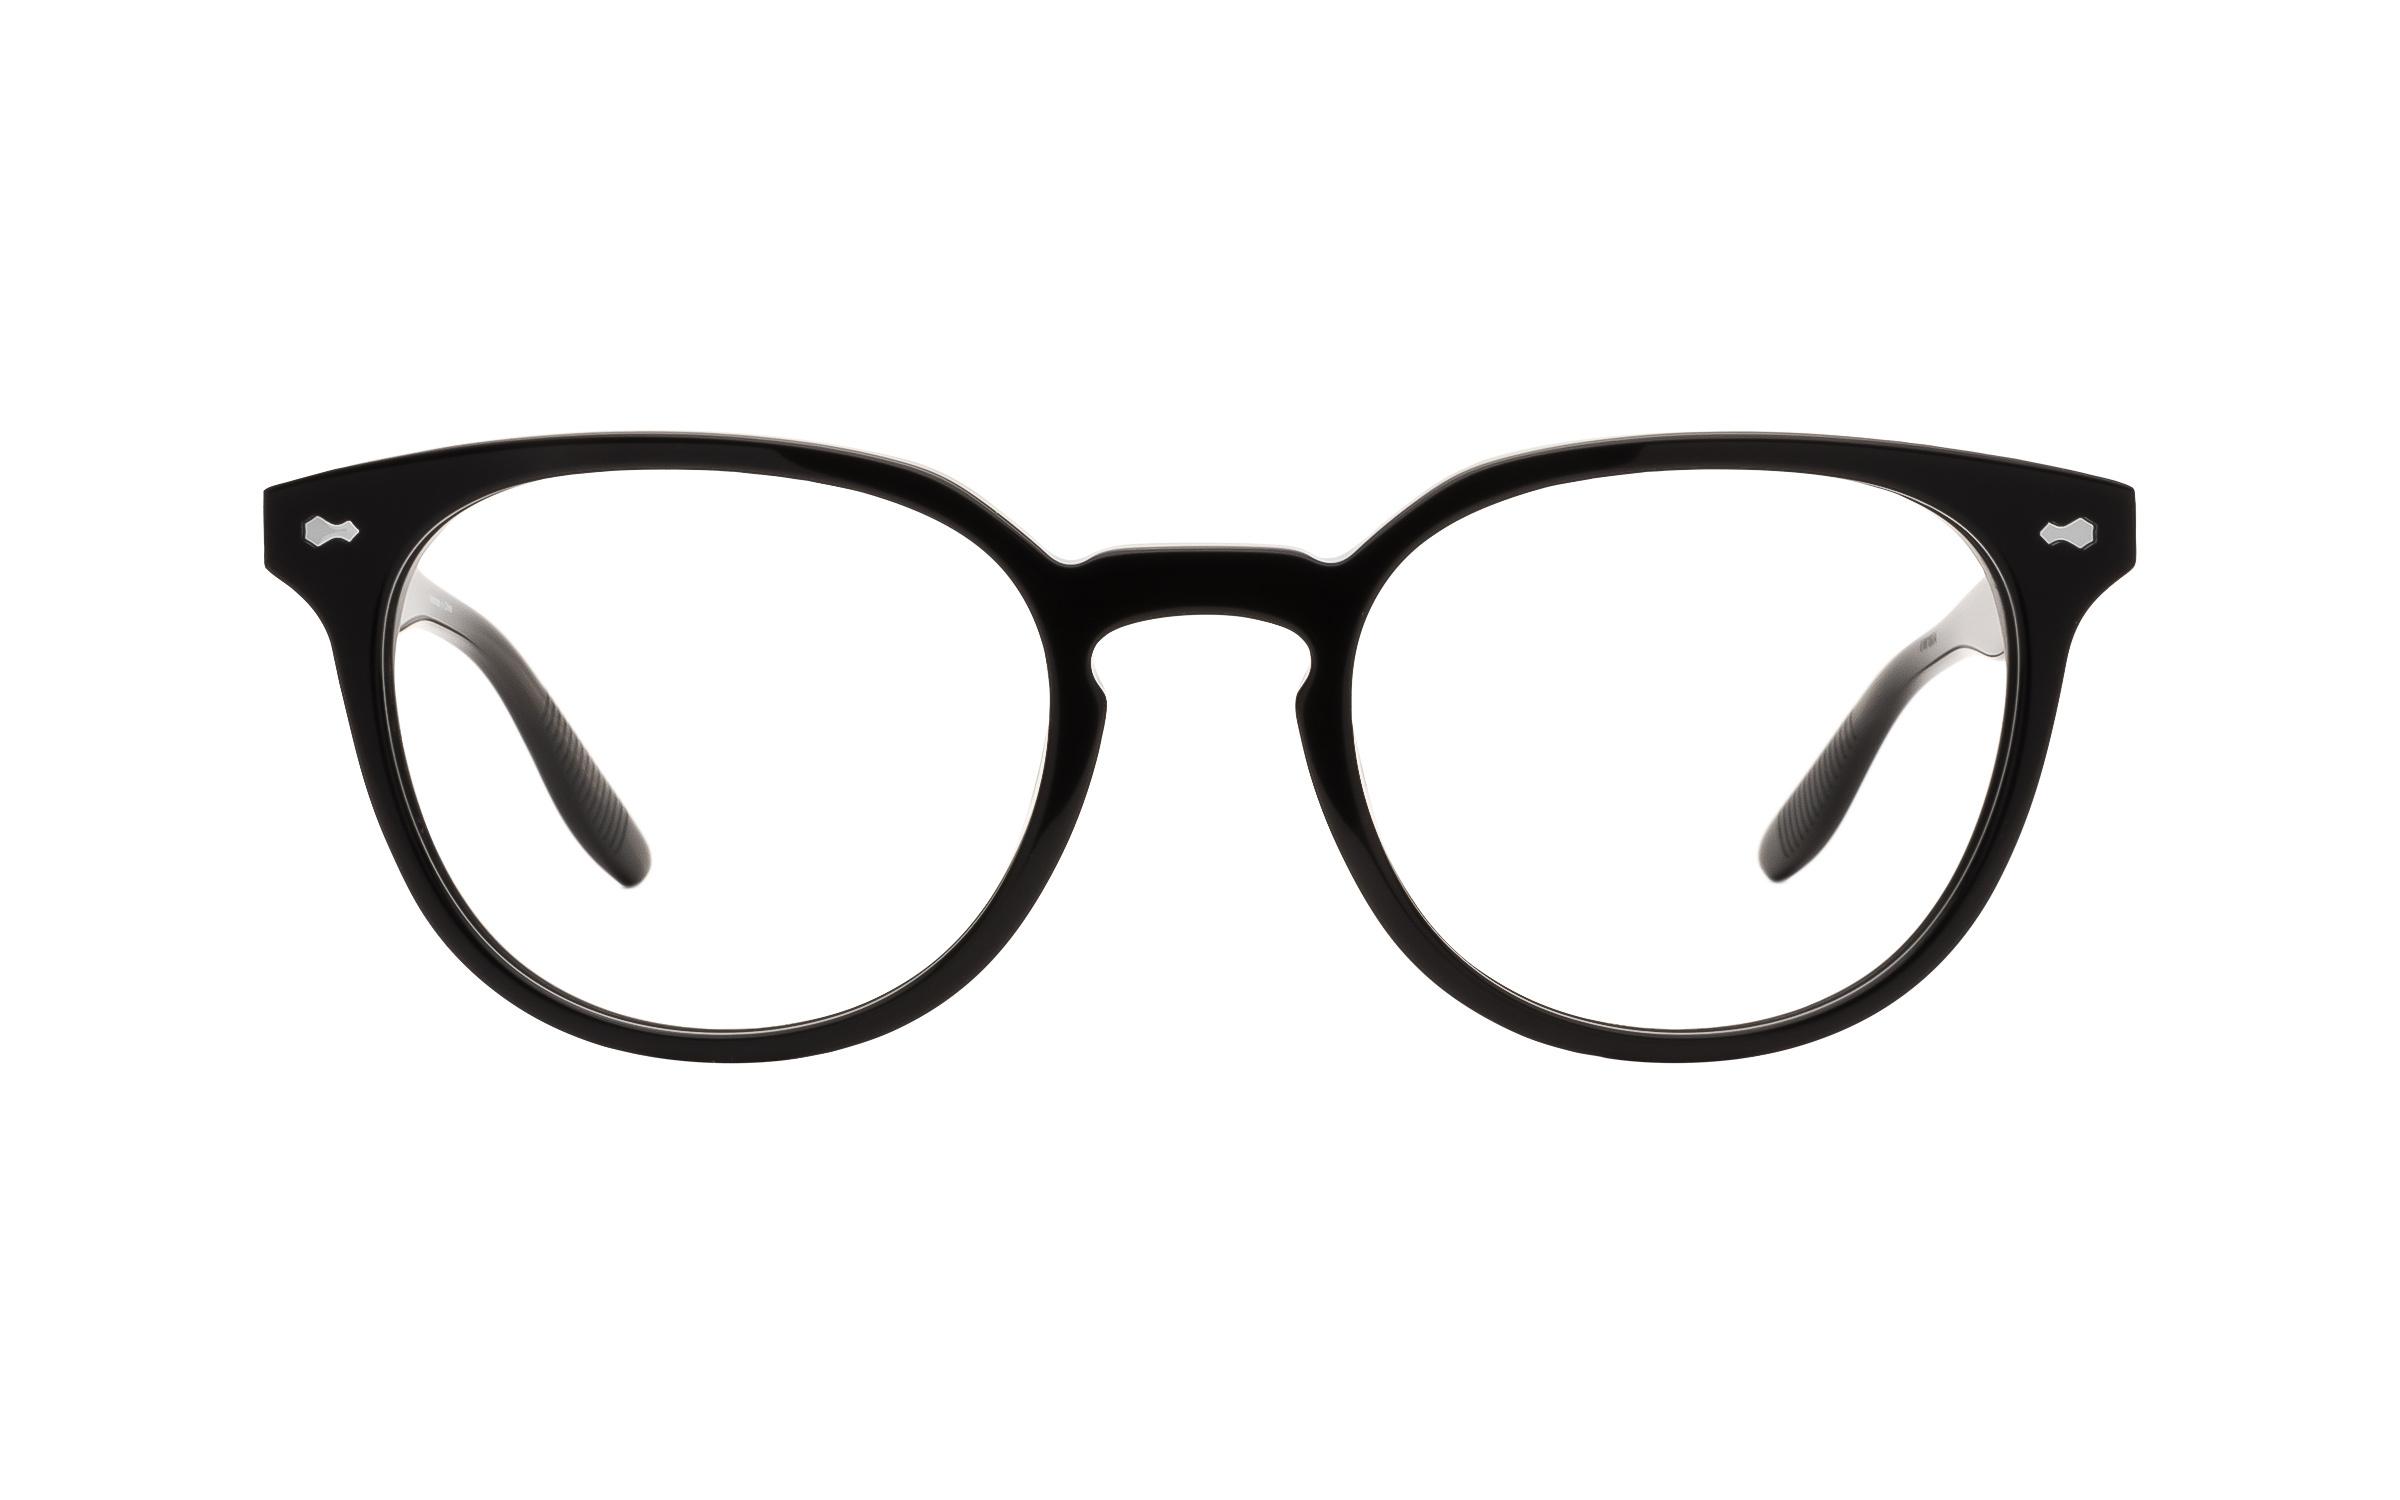 Men's Black Vintage Joseph Marc Glasses - Clearly Glasses Online